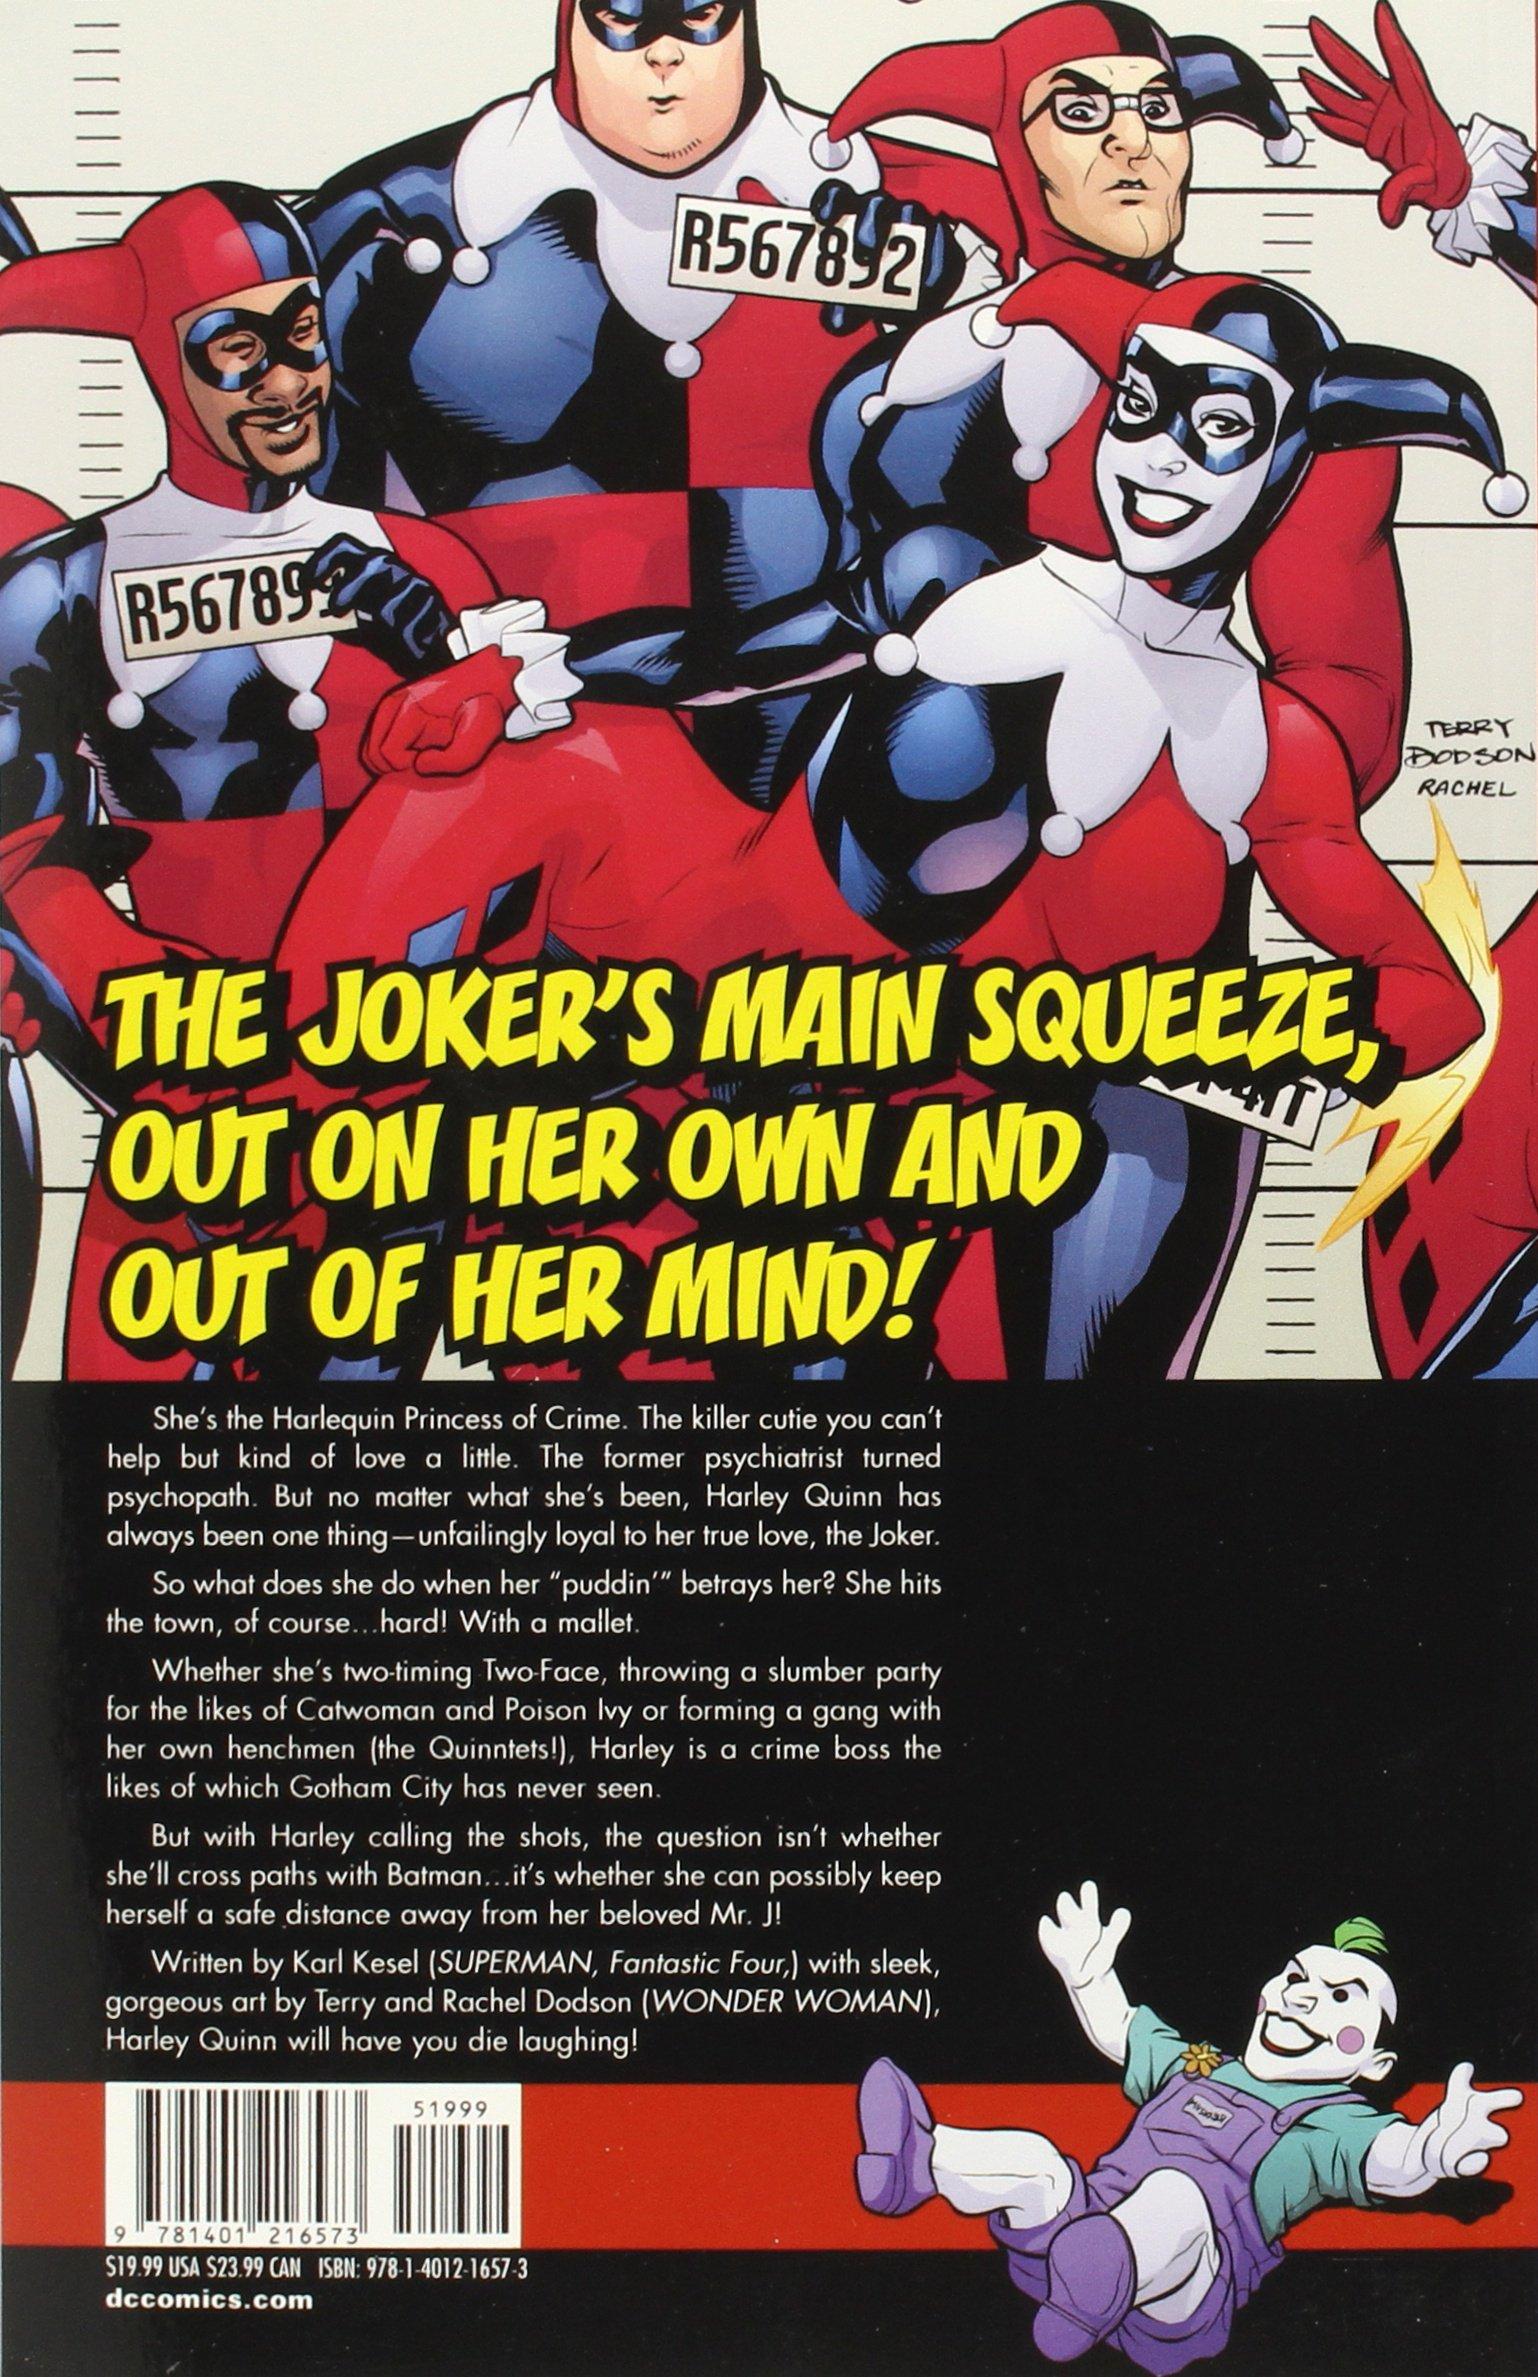 Batman The Animated Series 2-Pack The Joker /& Harley Quinn Mad Love OFFERTA